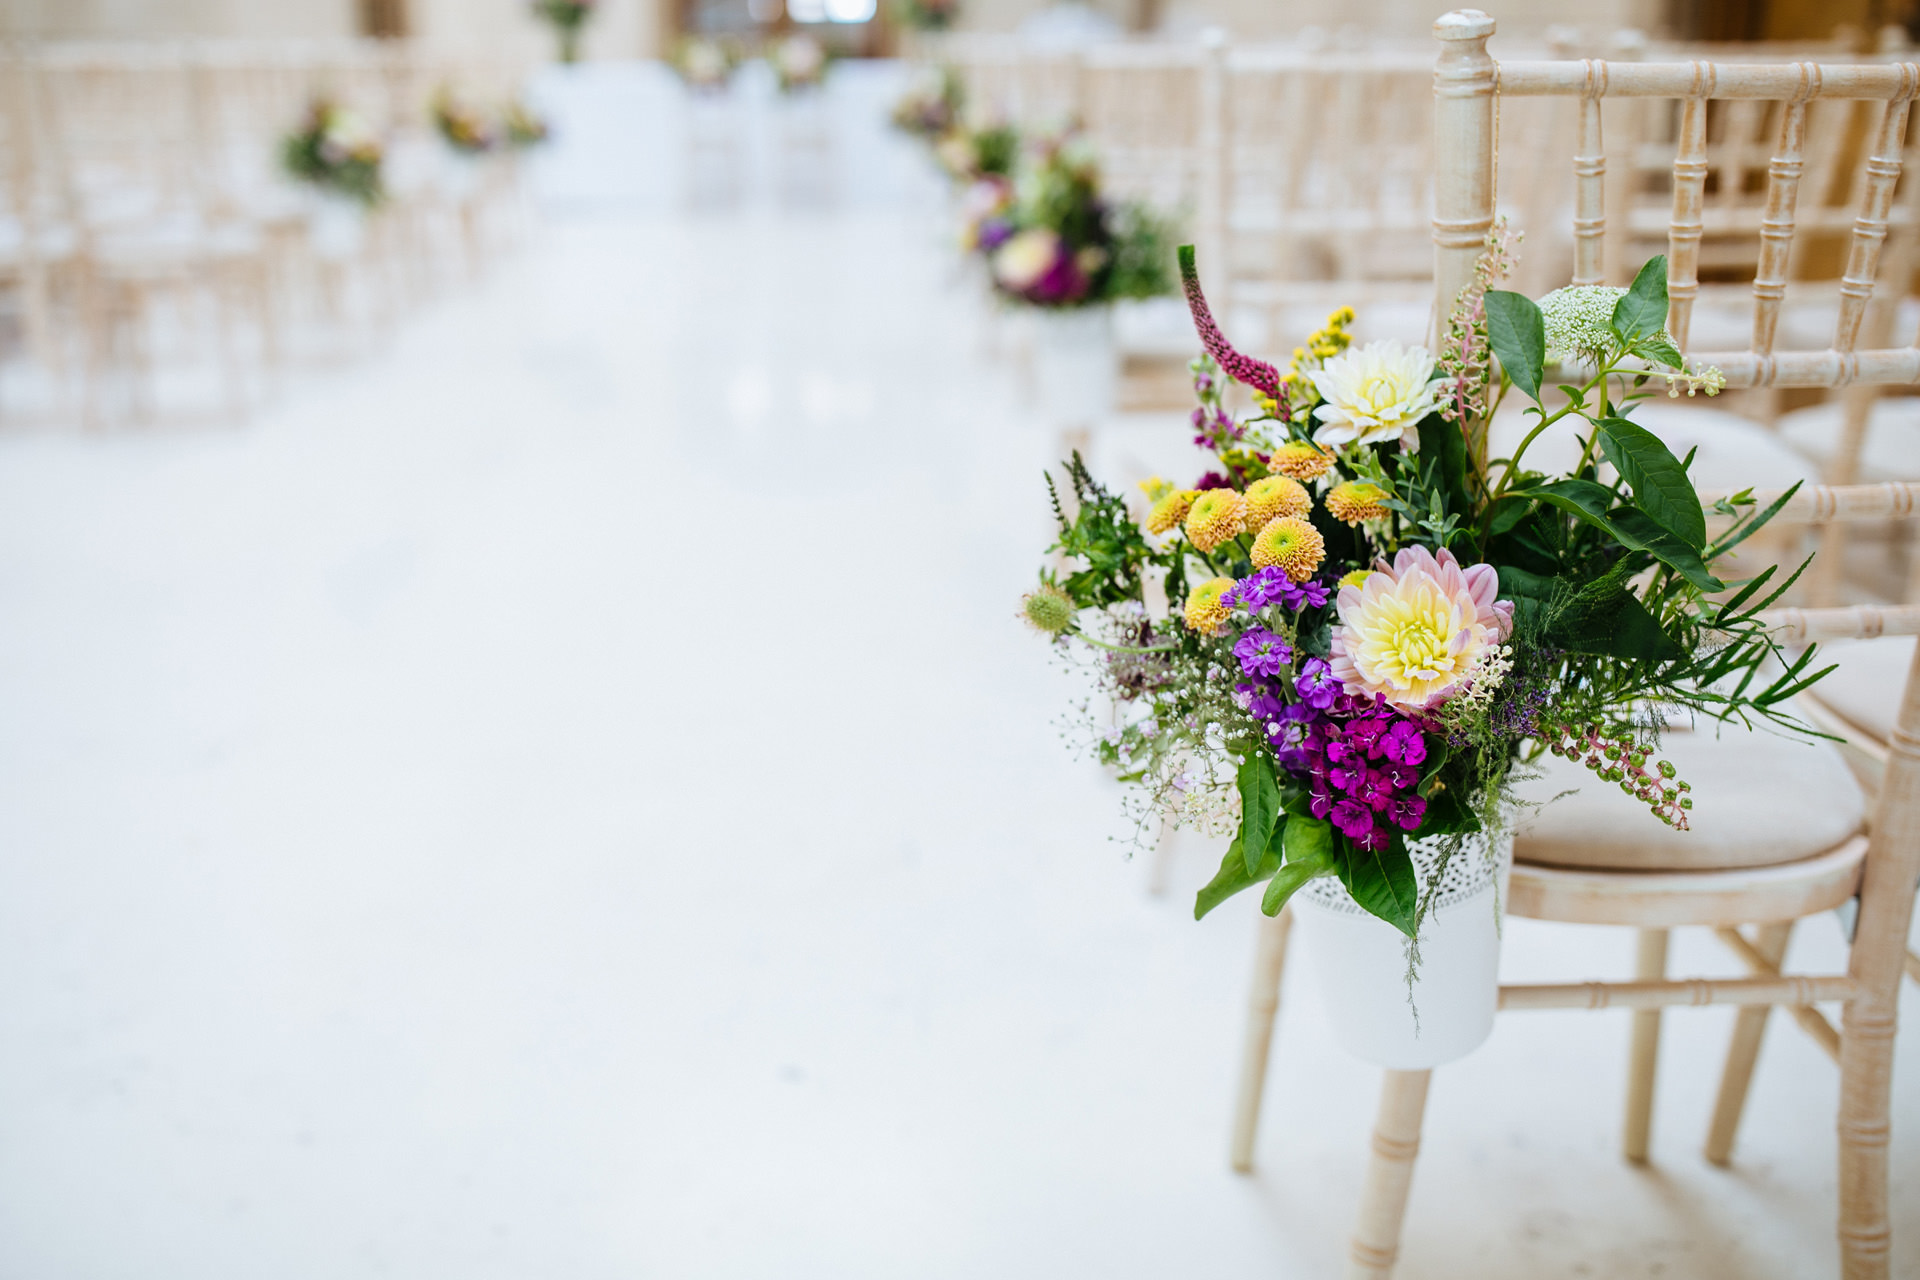 Hammersmith town hall wedding flowers